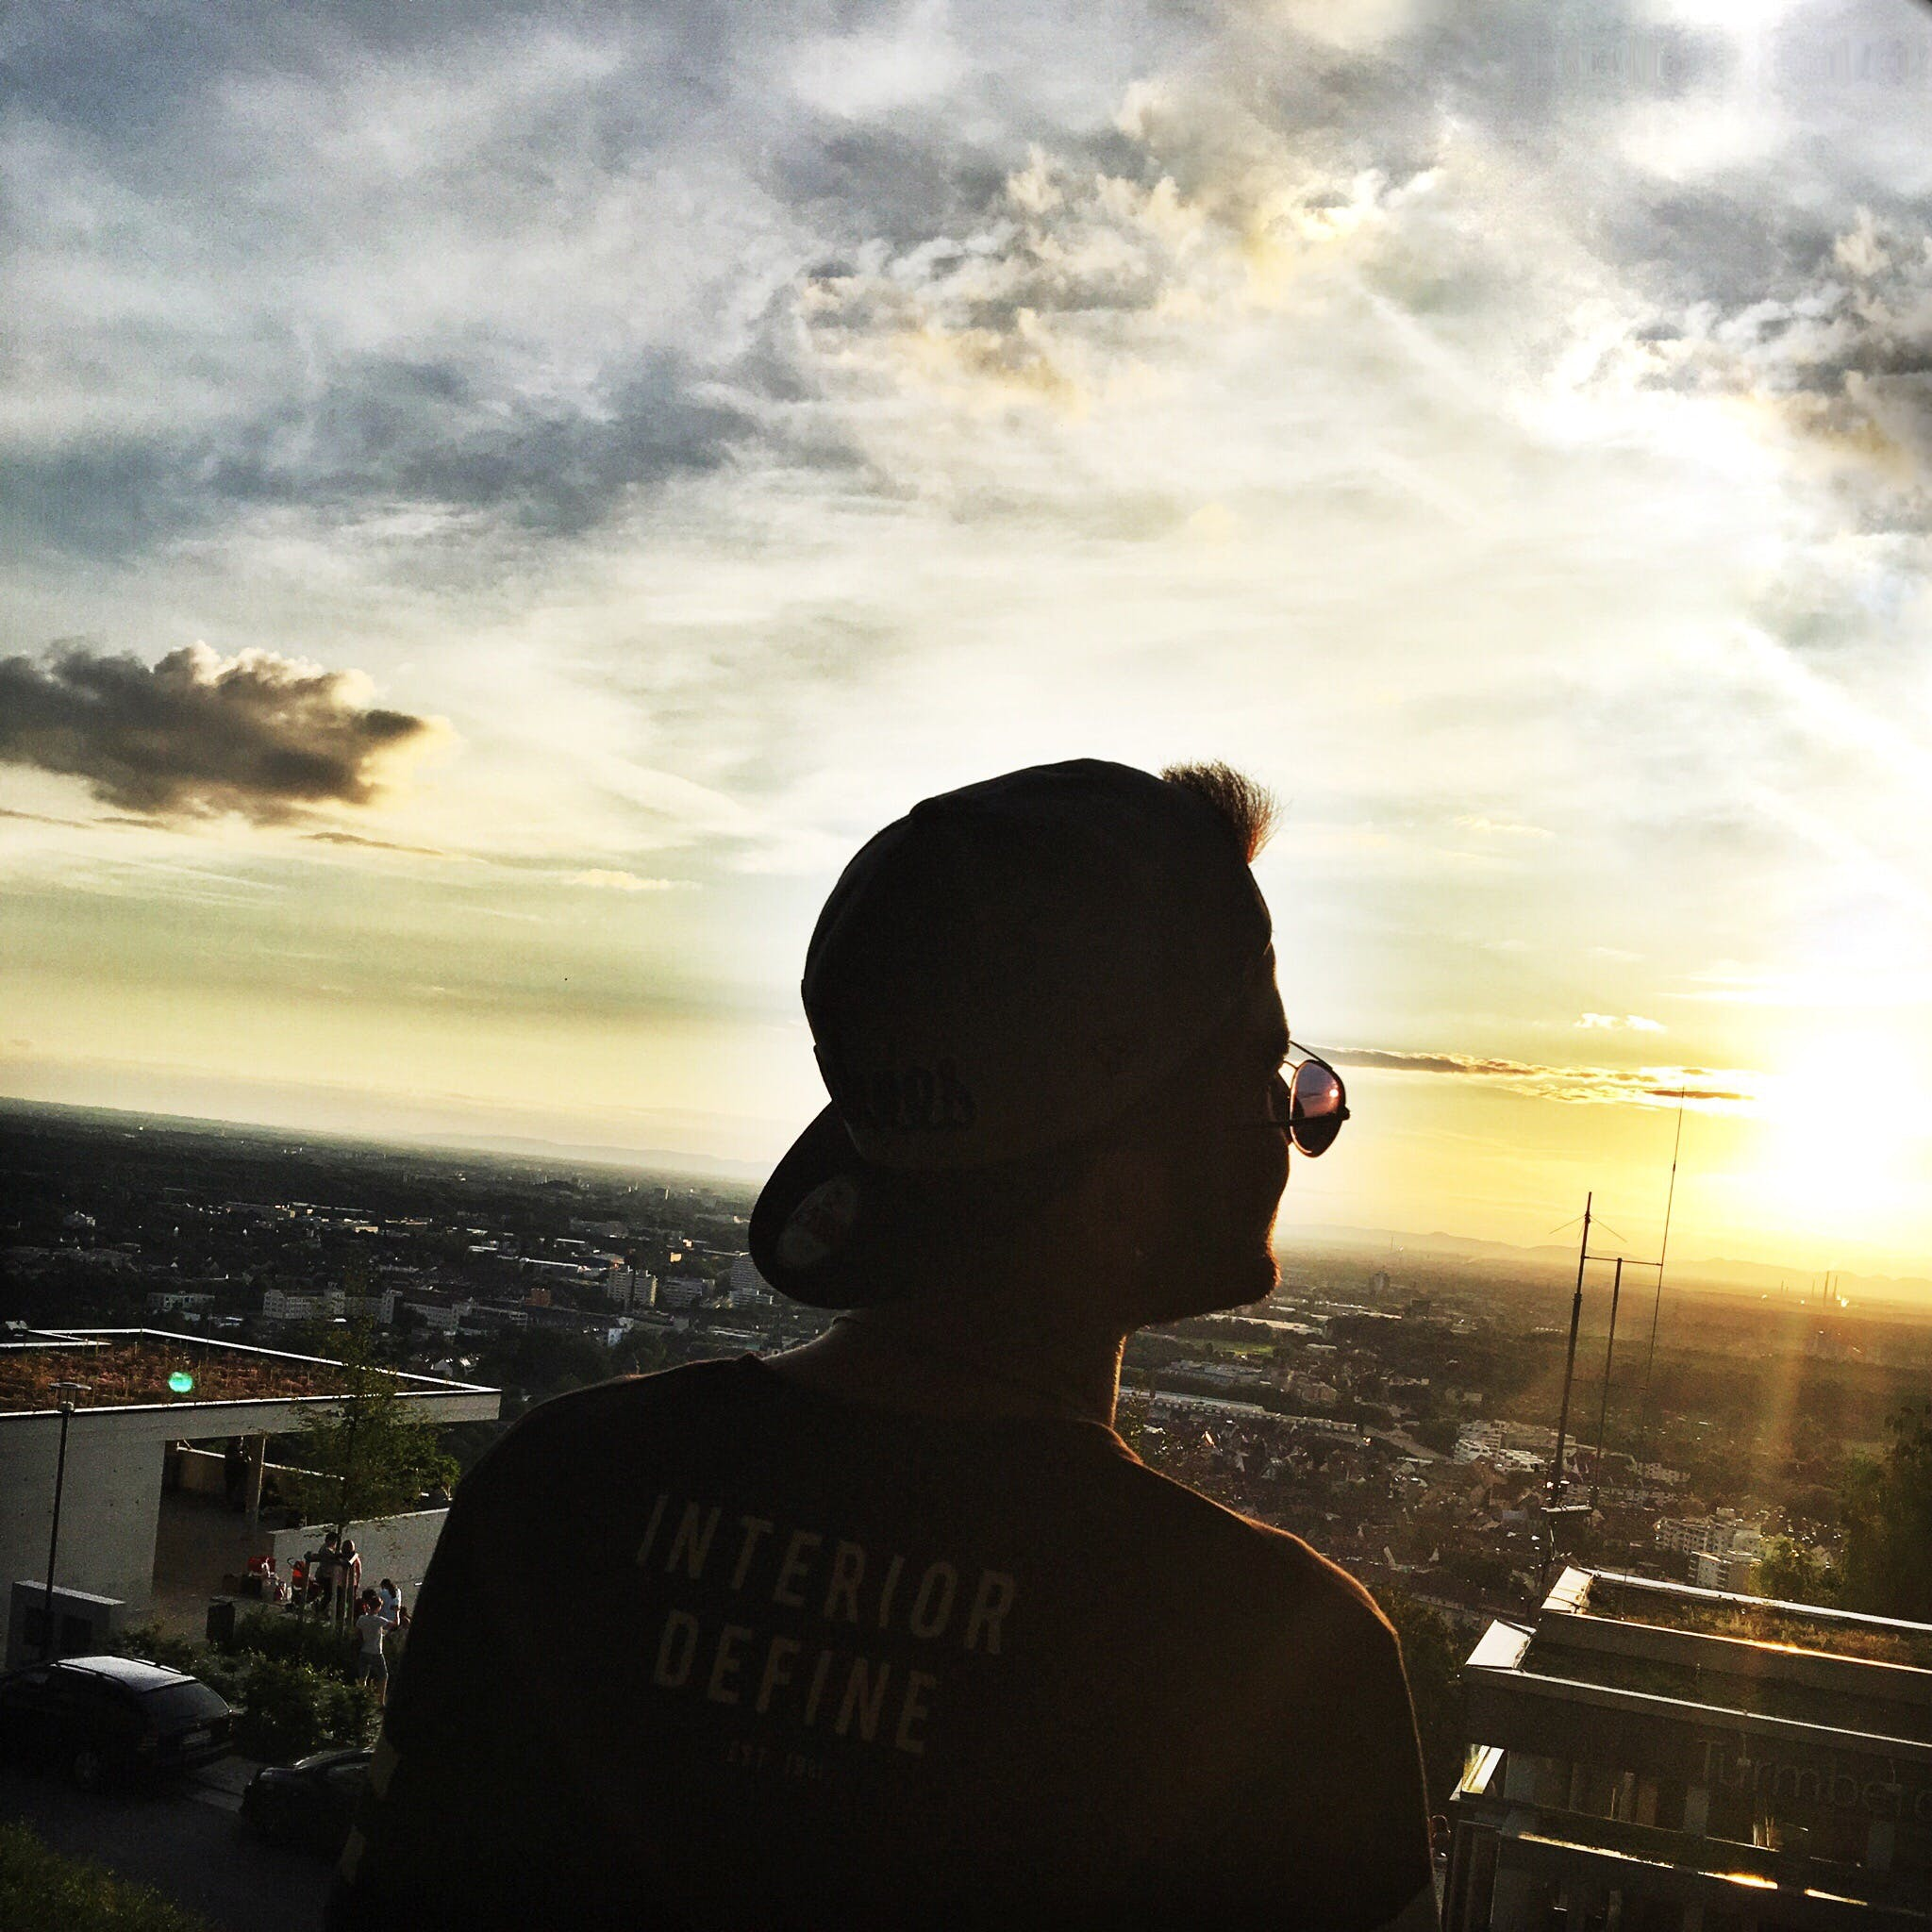 Free stock photo of boy, cap, Dark Sky, man